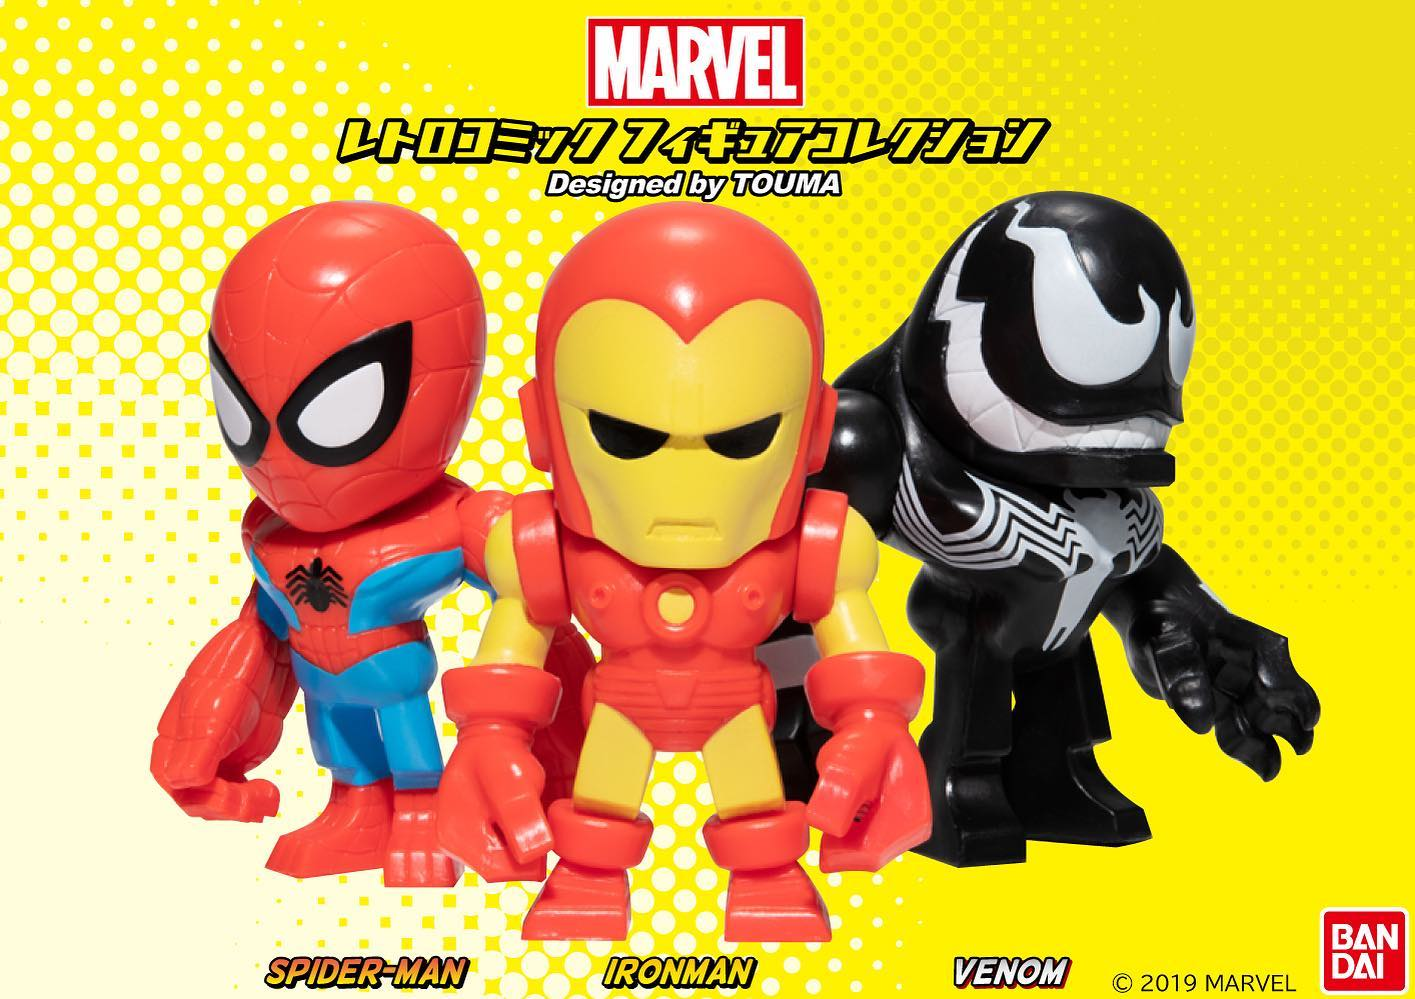 New Marvel Comic Characters Gacha Designed by TOUMA